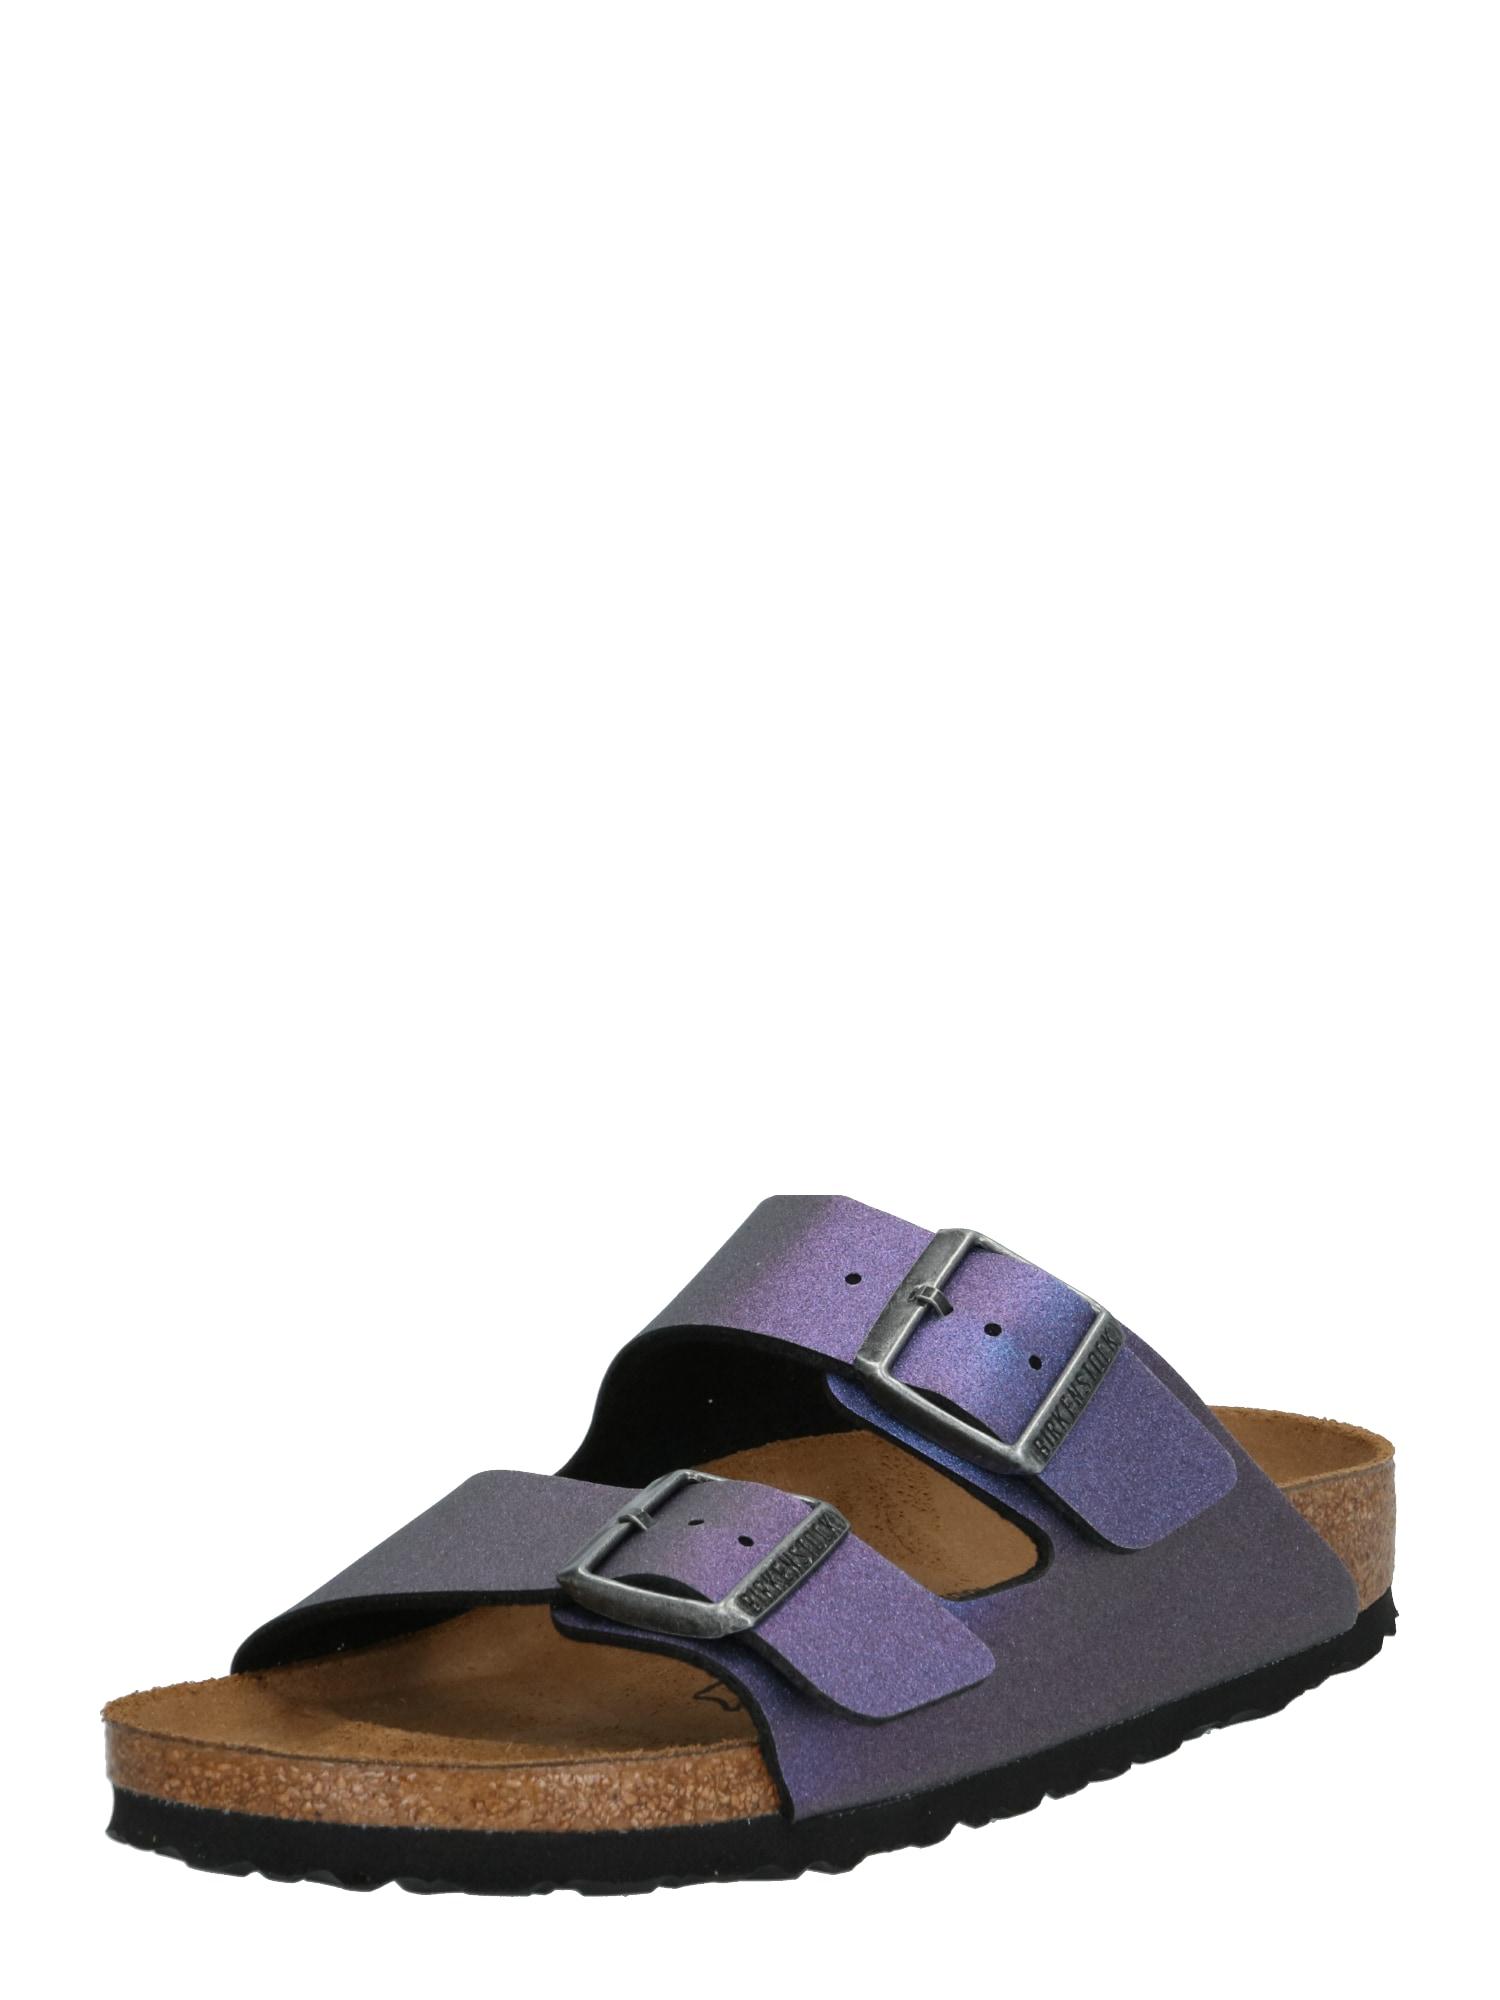 Pantofle Arizona ICY METALLIC modrá fialová BIRKENSTOCK